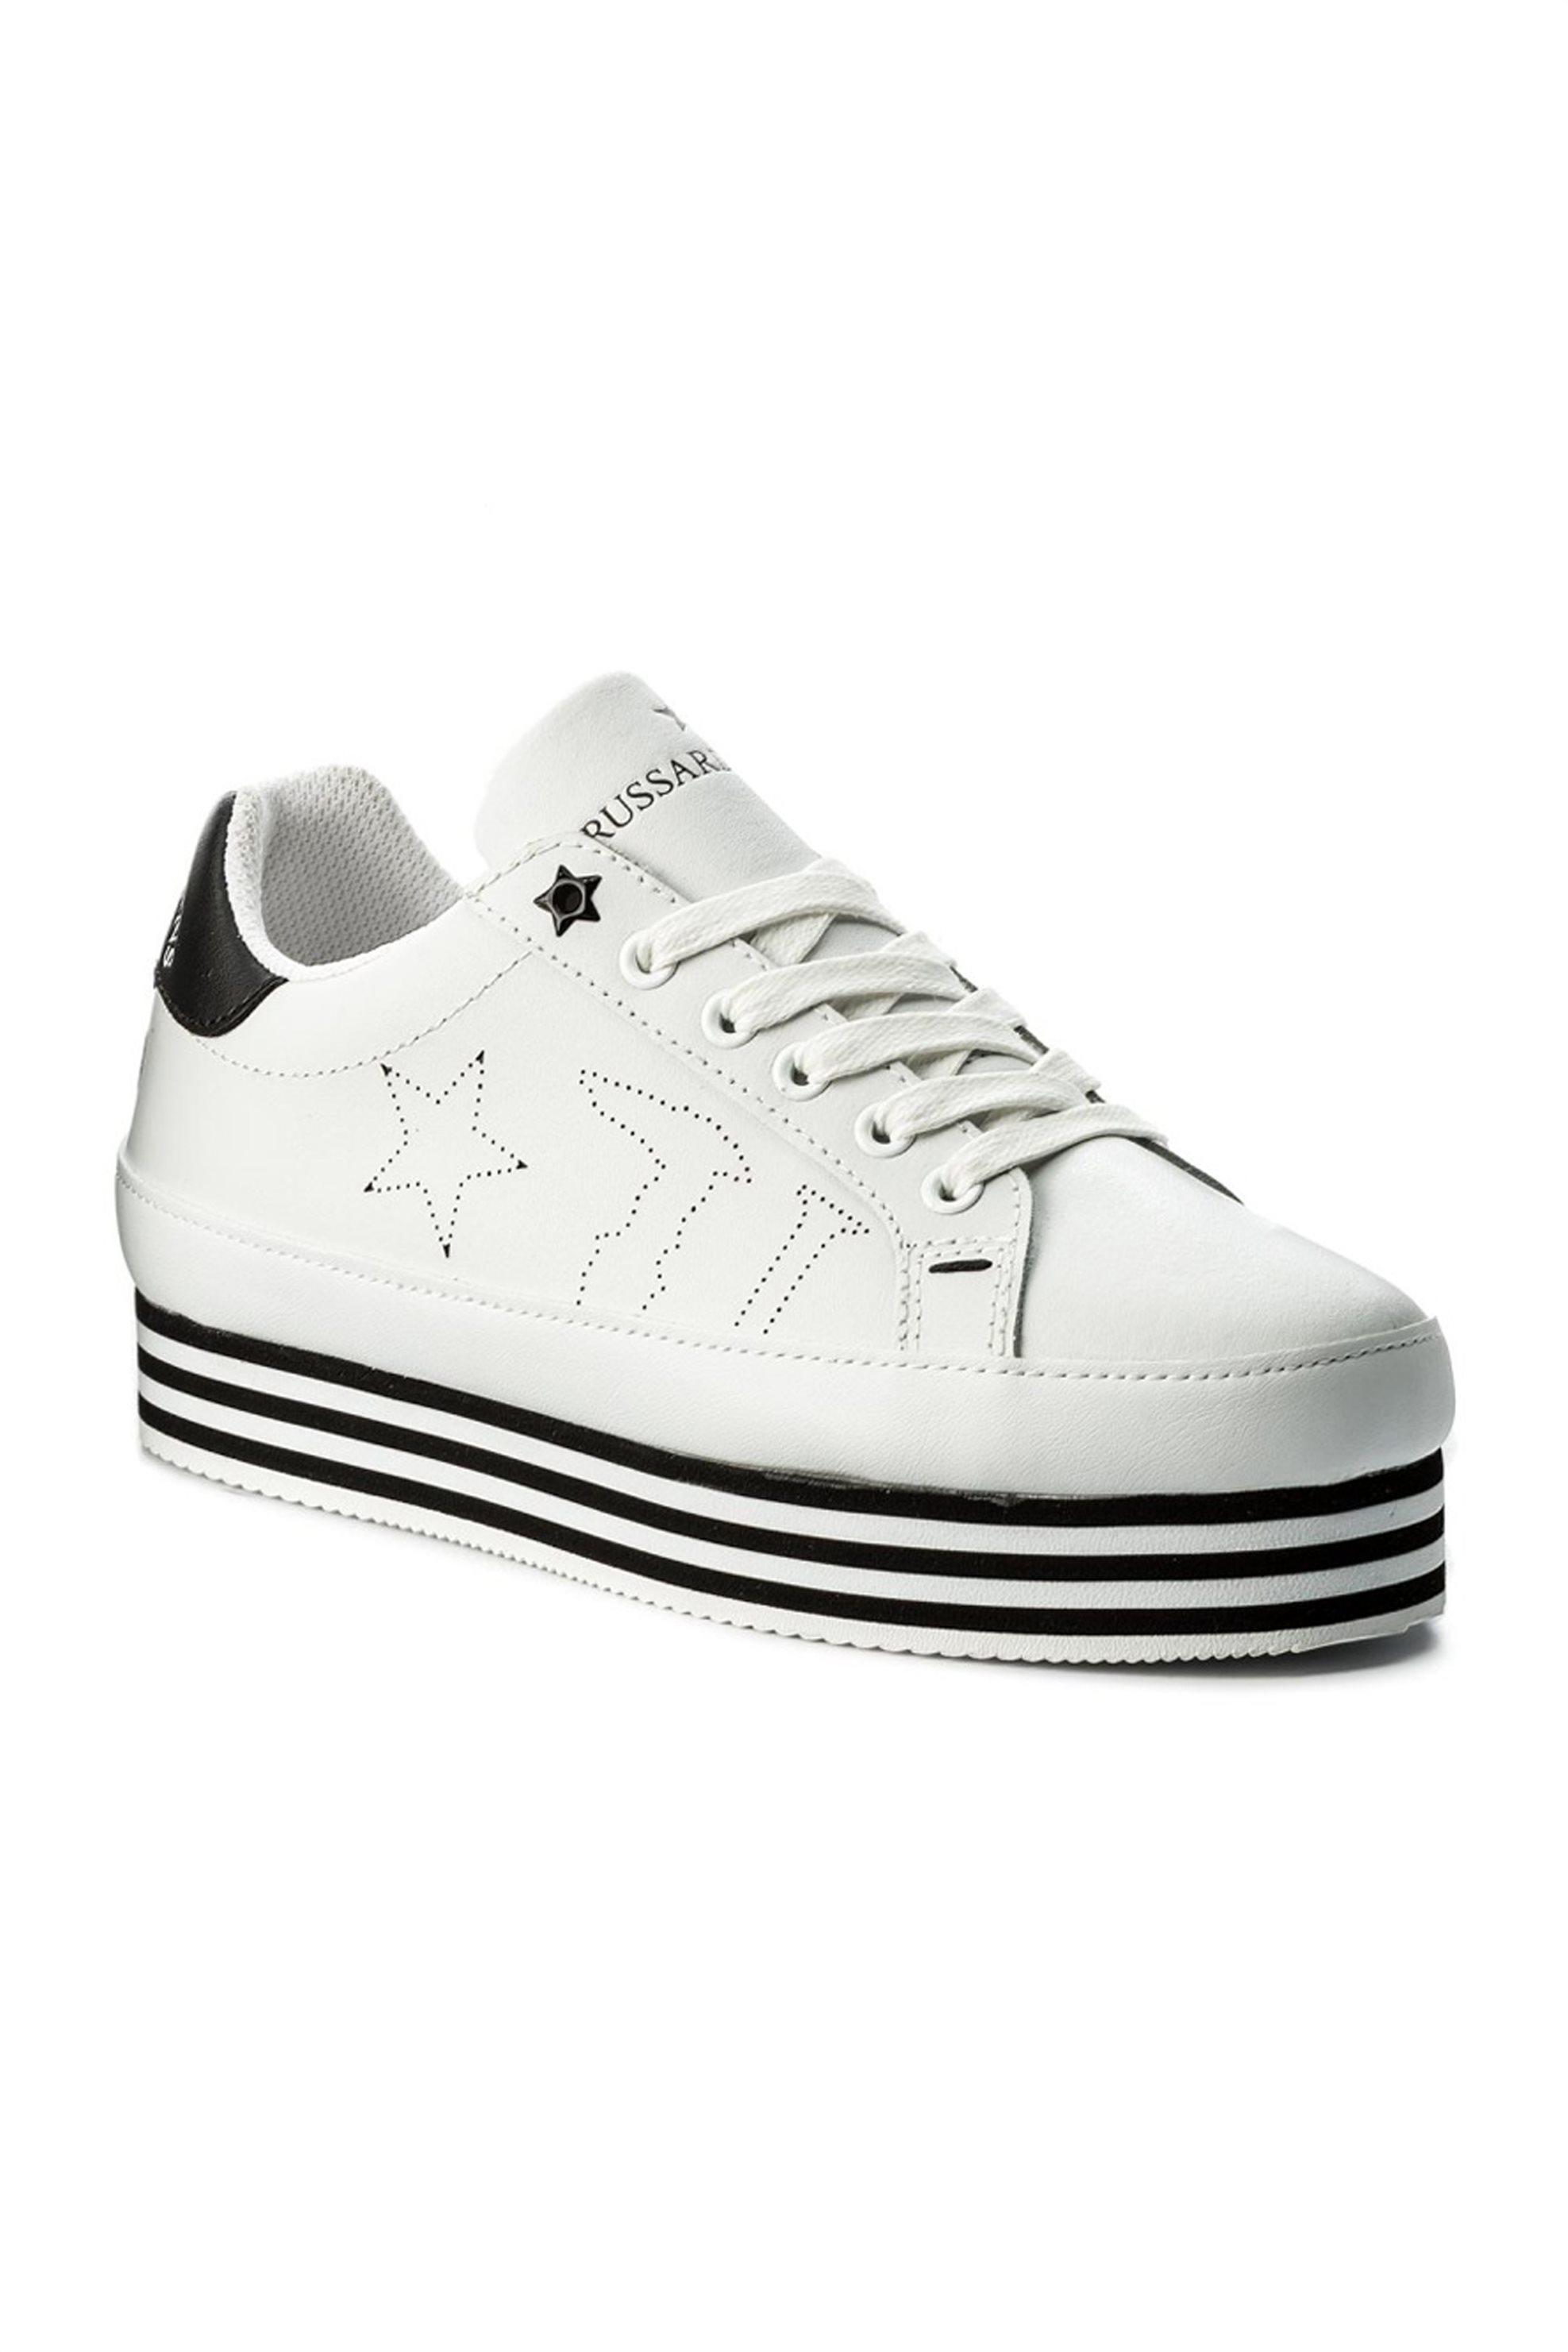 Trussardi γυναικεία chunky sneakers με υπερυψωμένη σόλα – 79A00129-9Y099999 – Λευκό